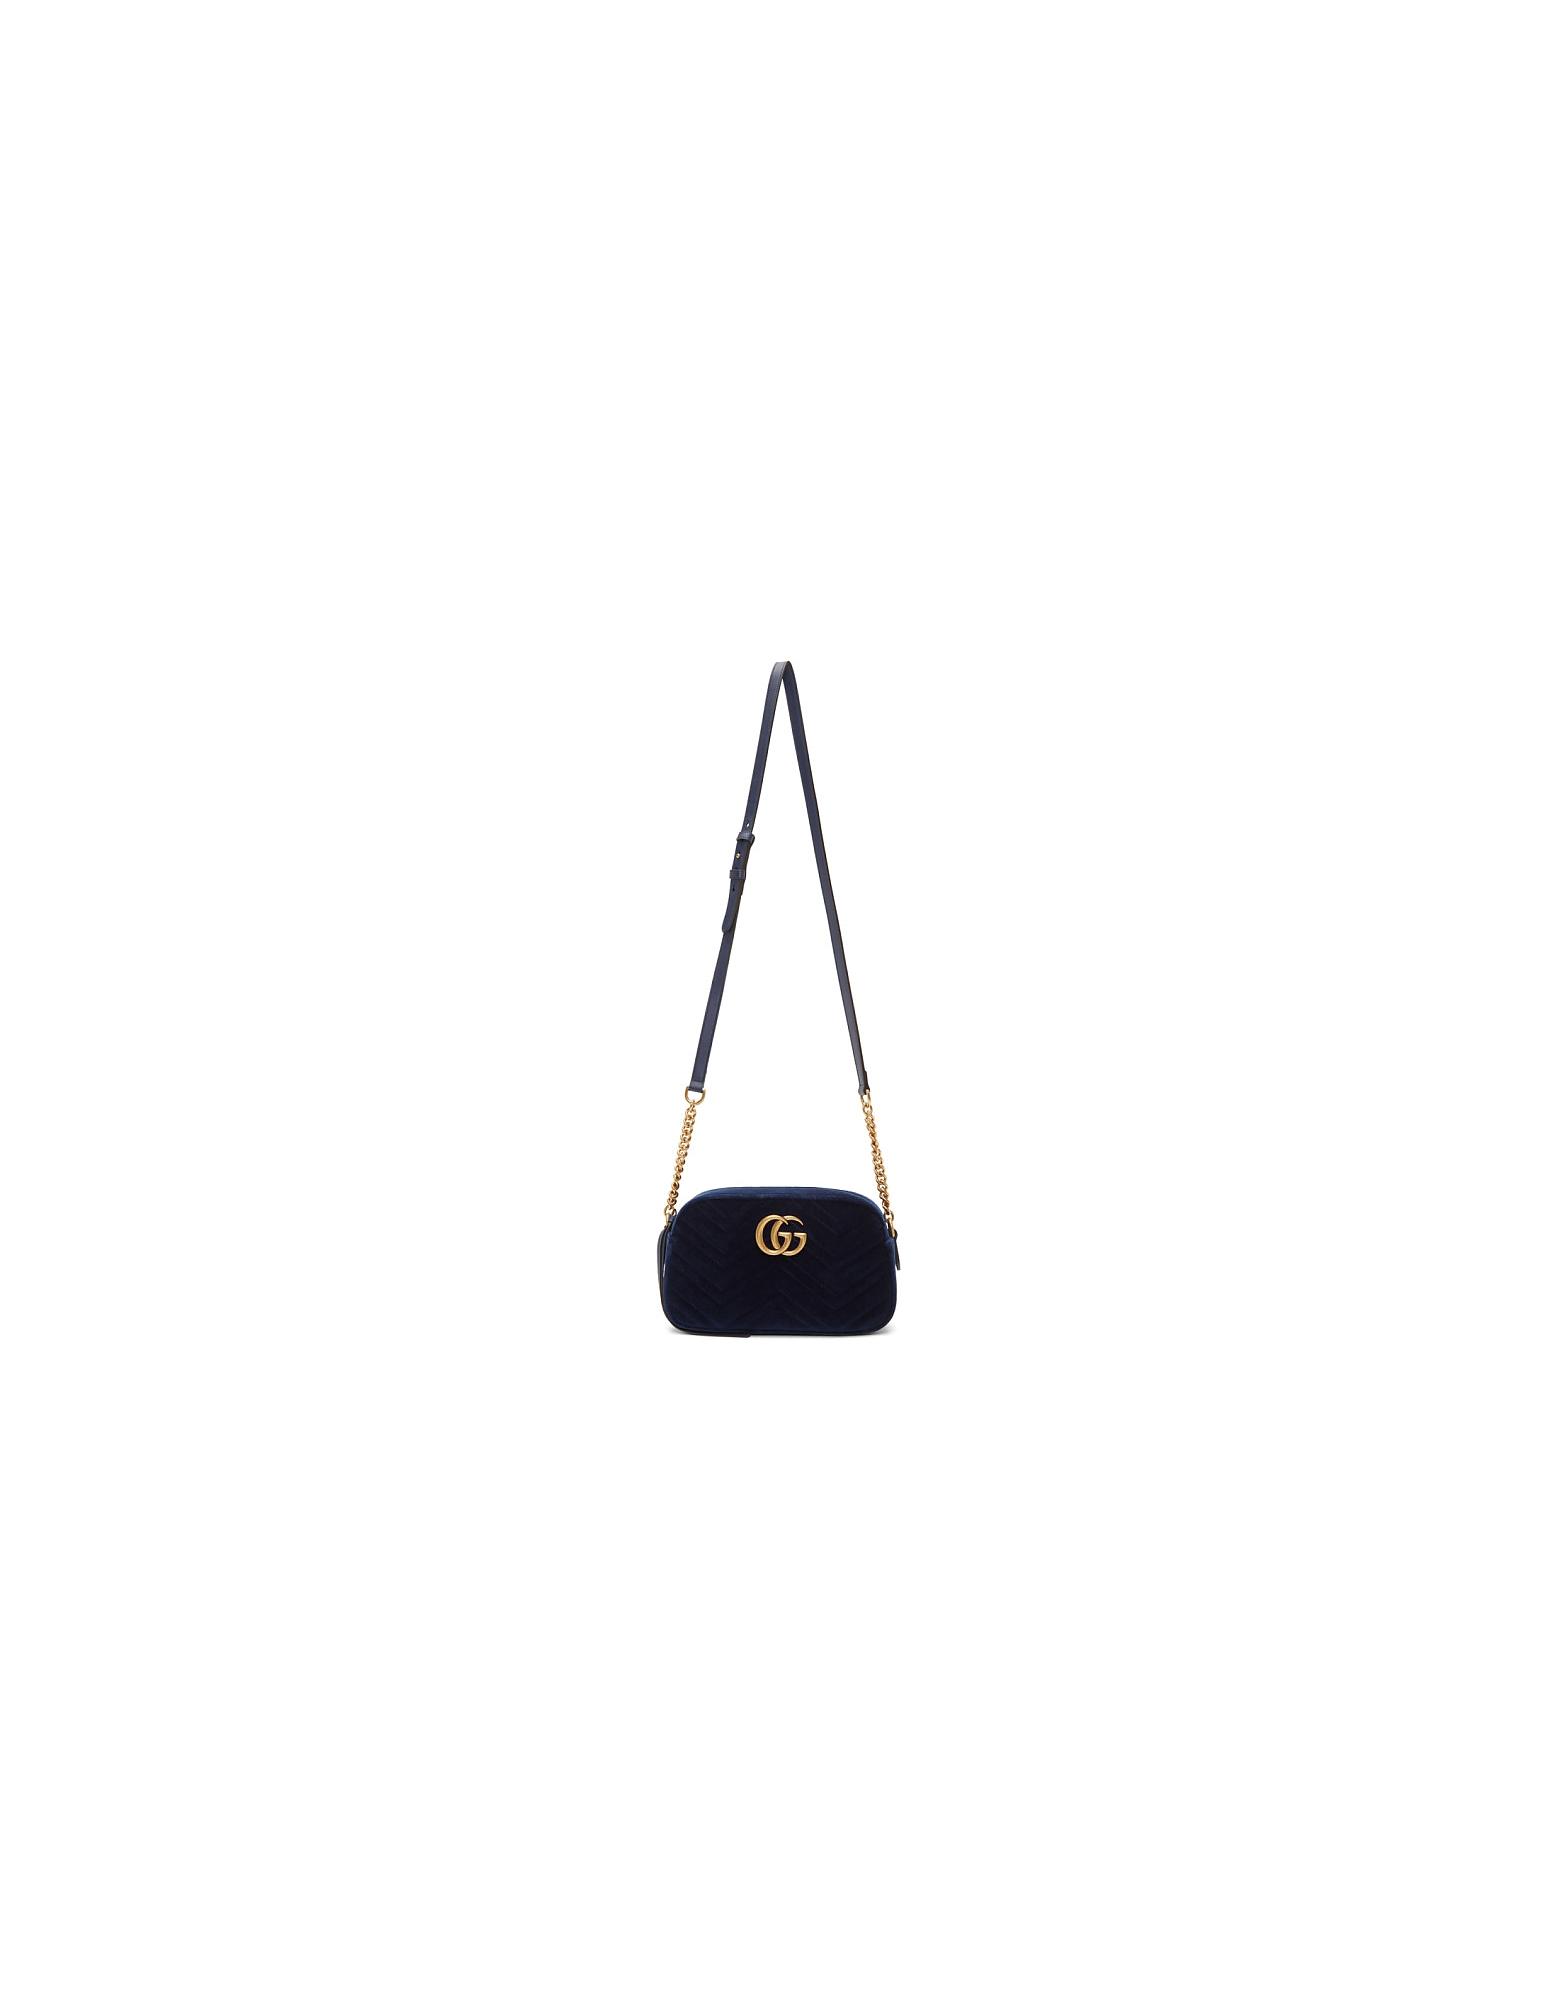 Gucci Designer Handbags, Blue Velvet Small GG Marmont 2.0 Shoulder Bag